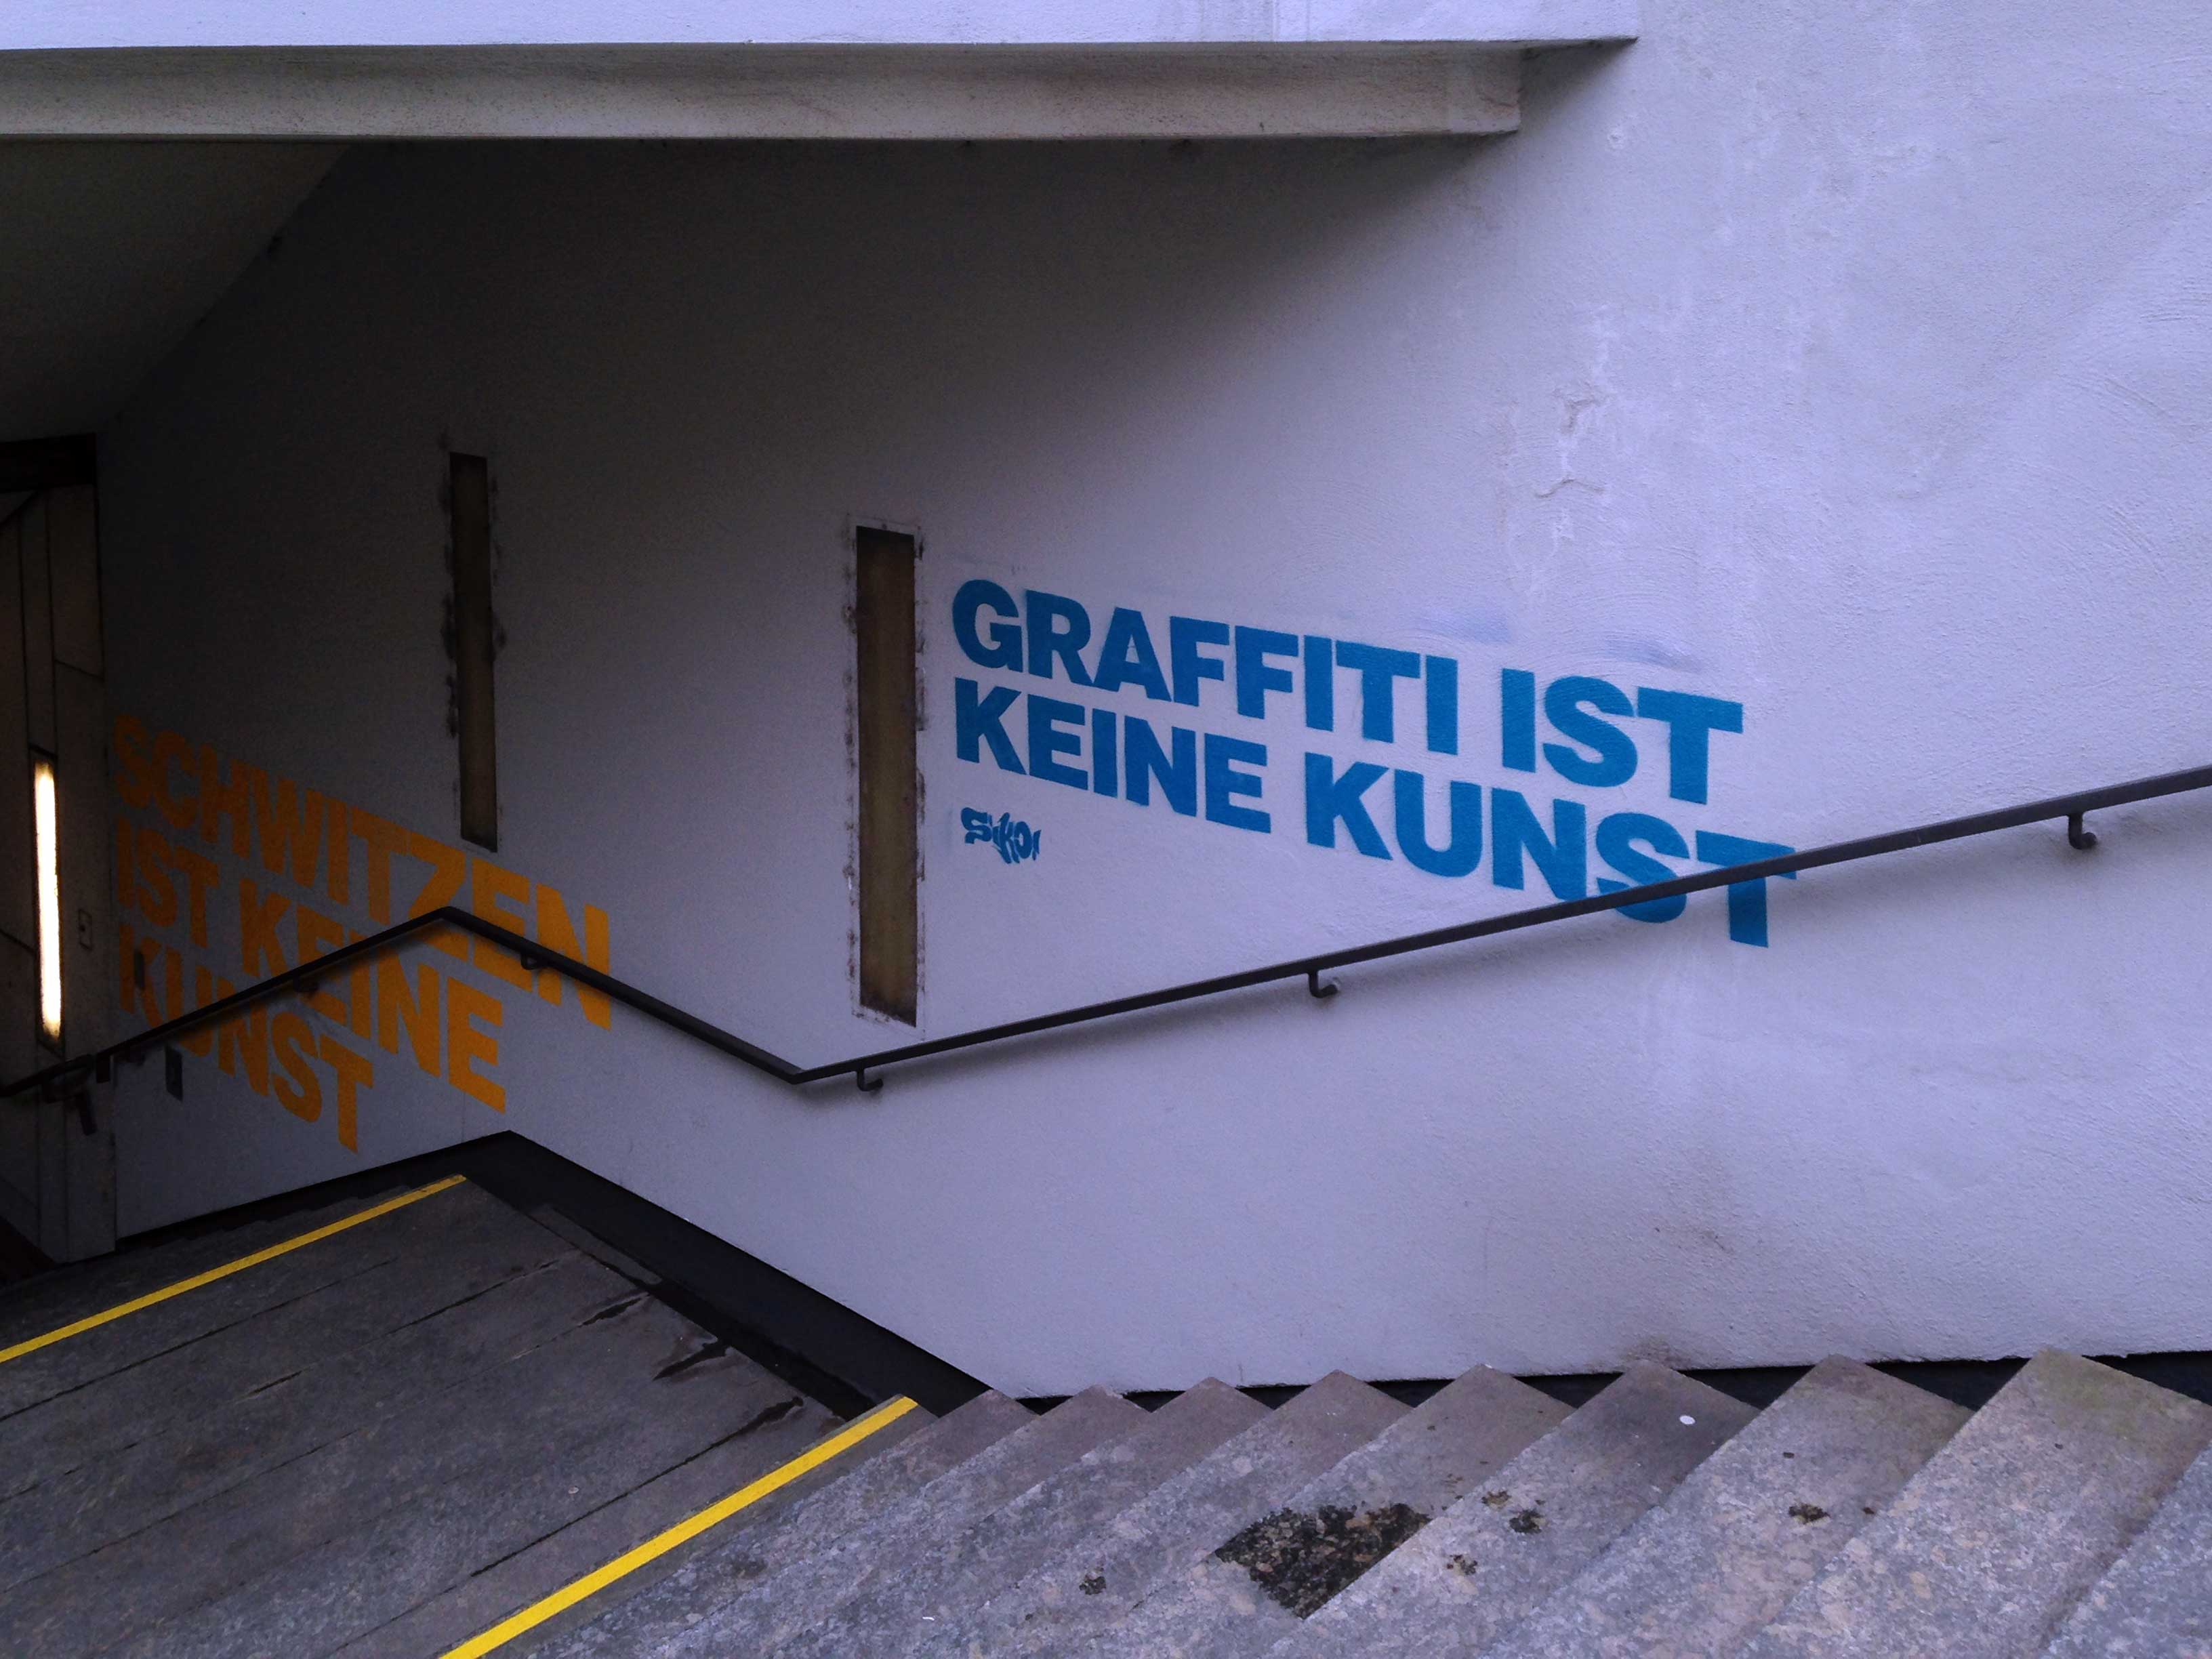 GRAFFITI IST KEINE KUNST